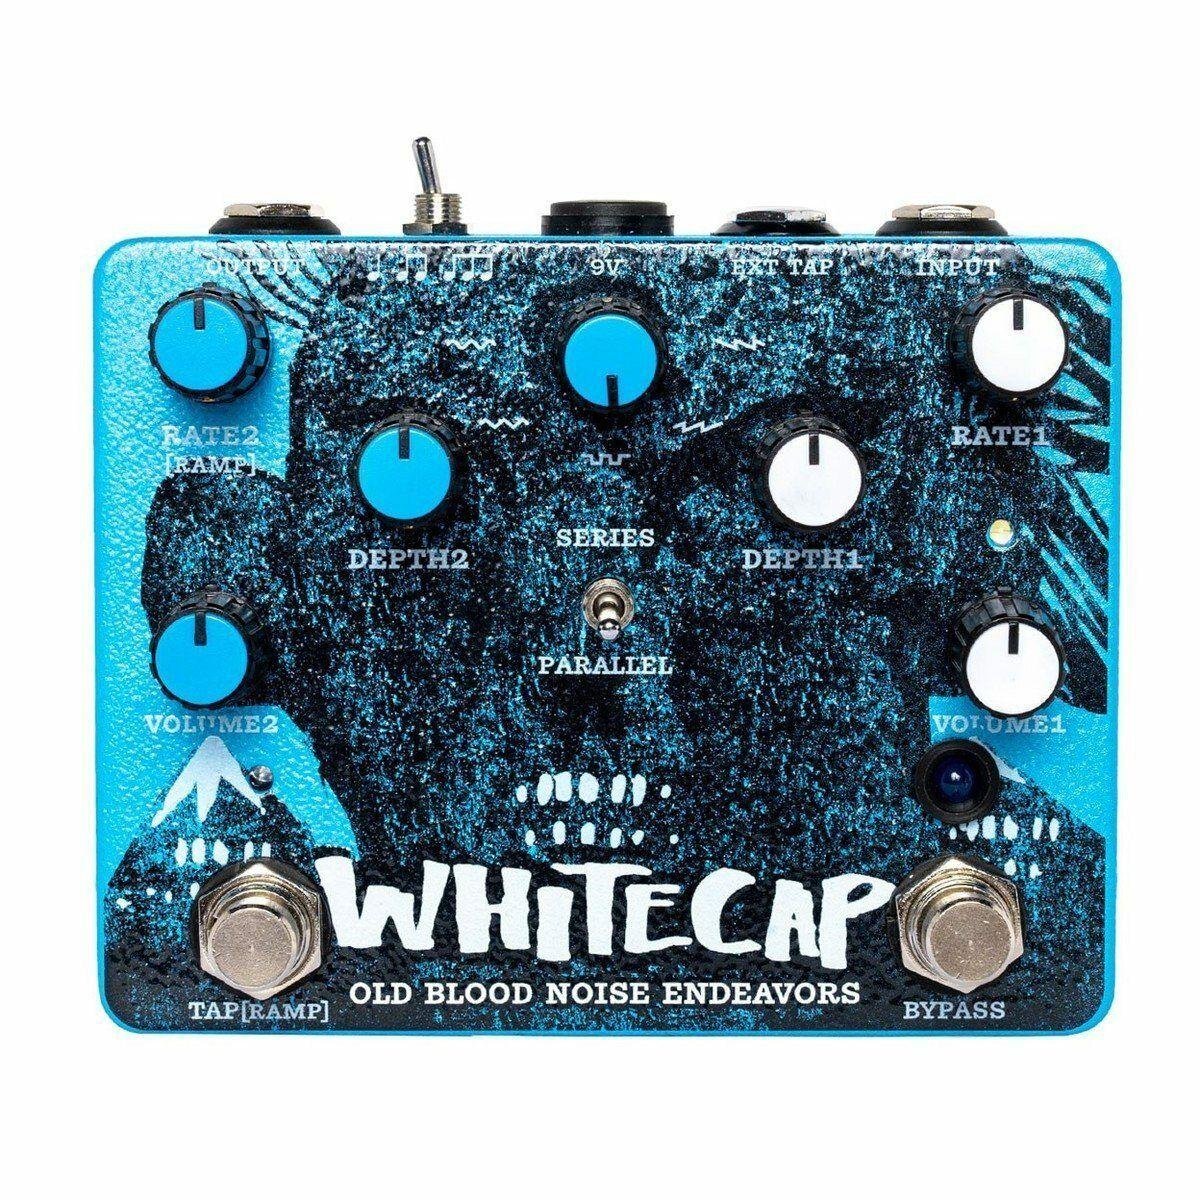 Old Blood Noise Endeavors Whitecap